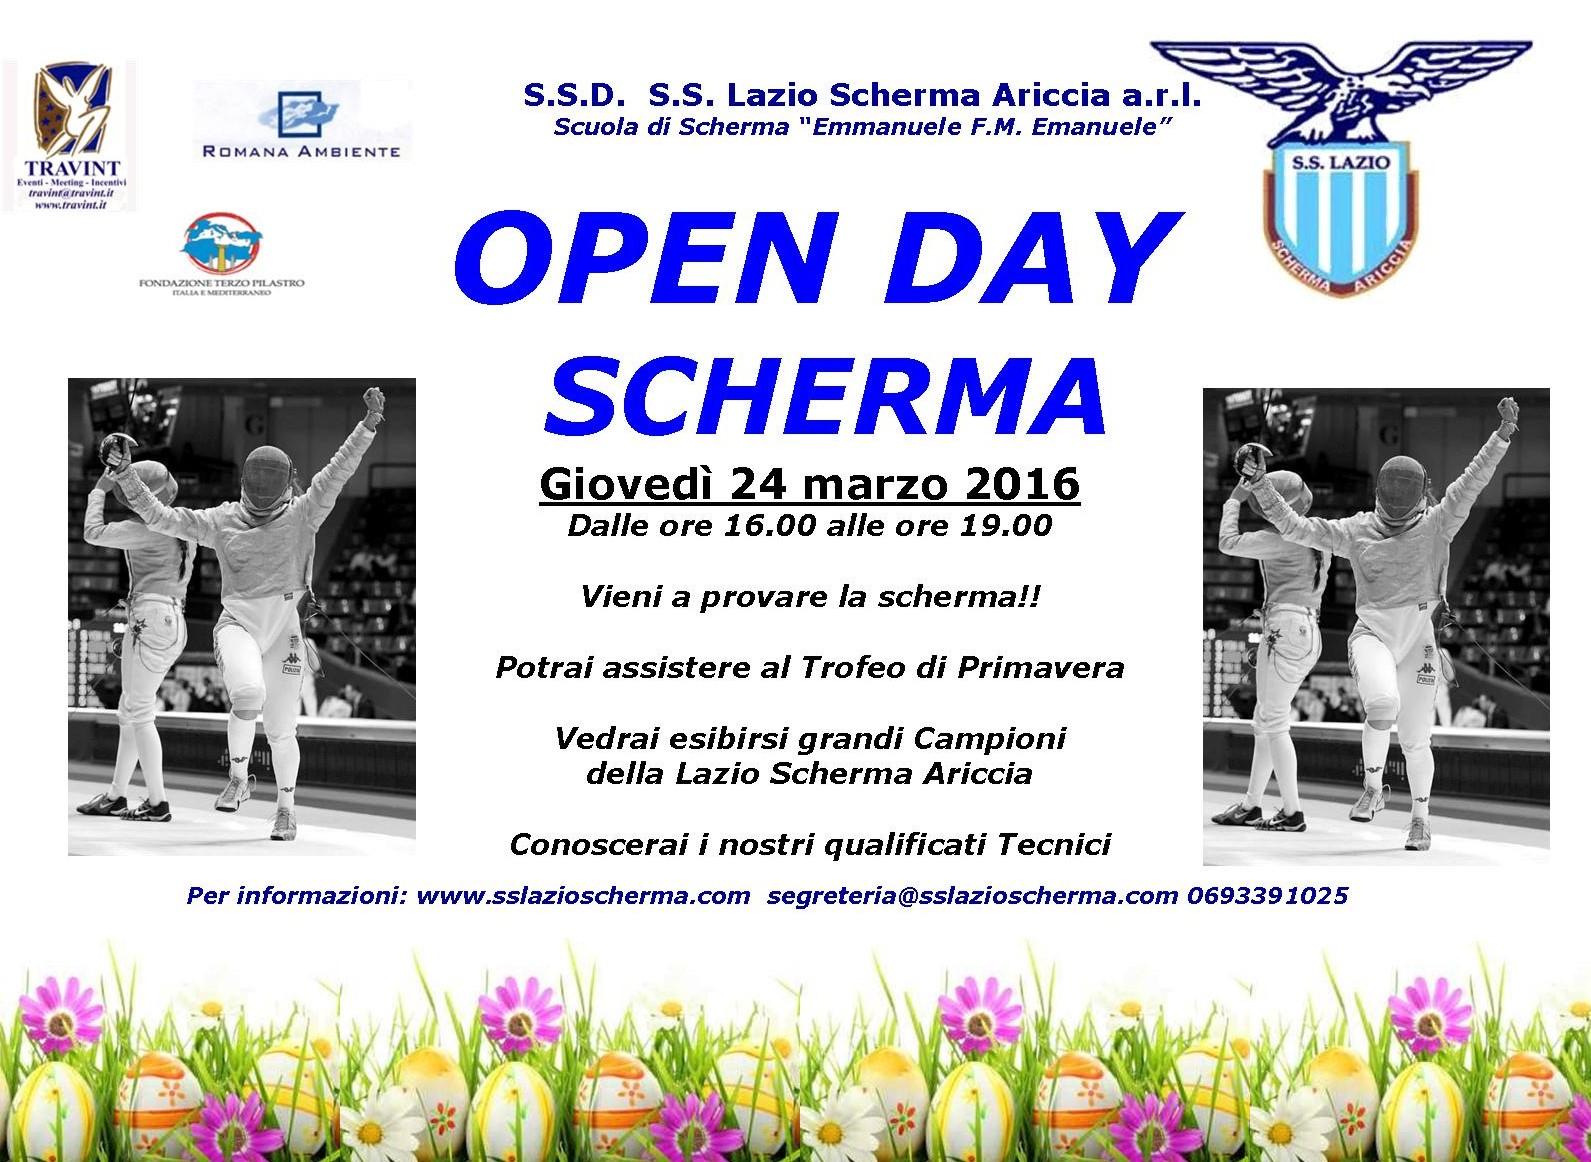 OPEN DAY LAZIO SCHERMA